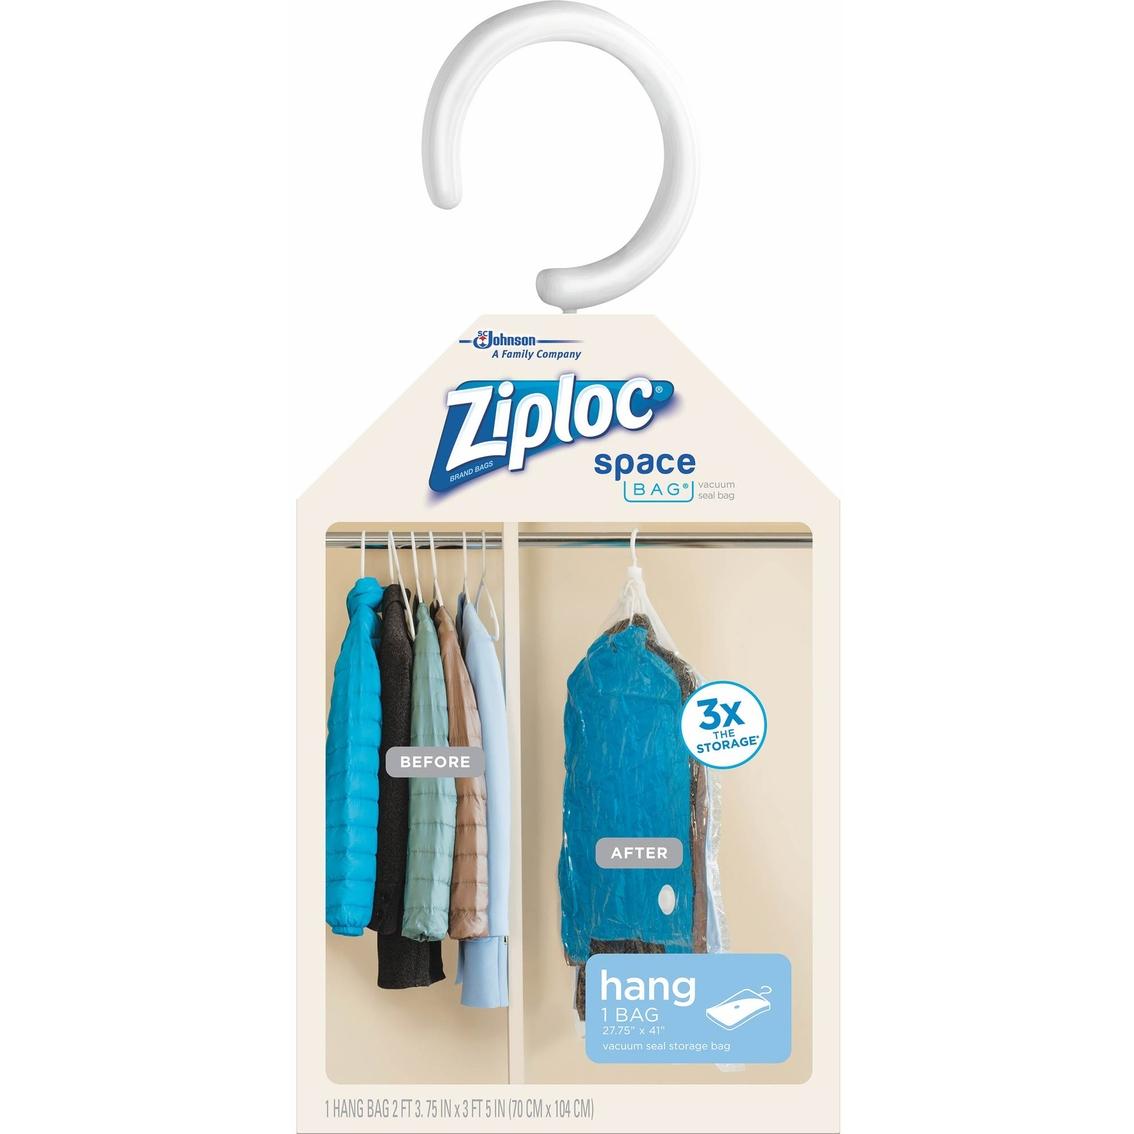 b0902616dfb2 Ziploc Space Bag Hanging Suit Storage